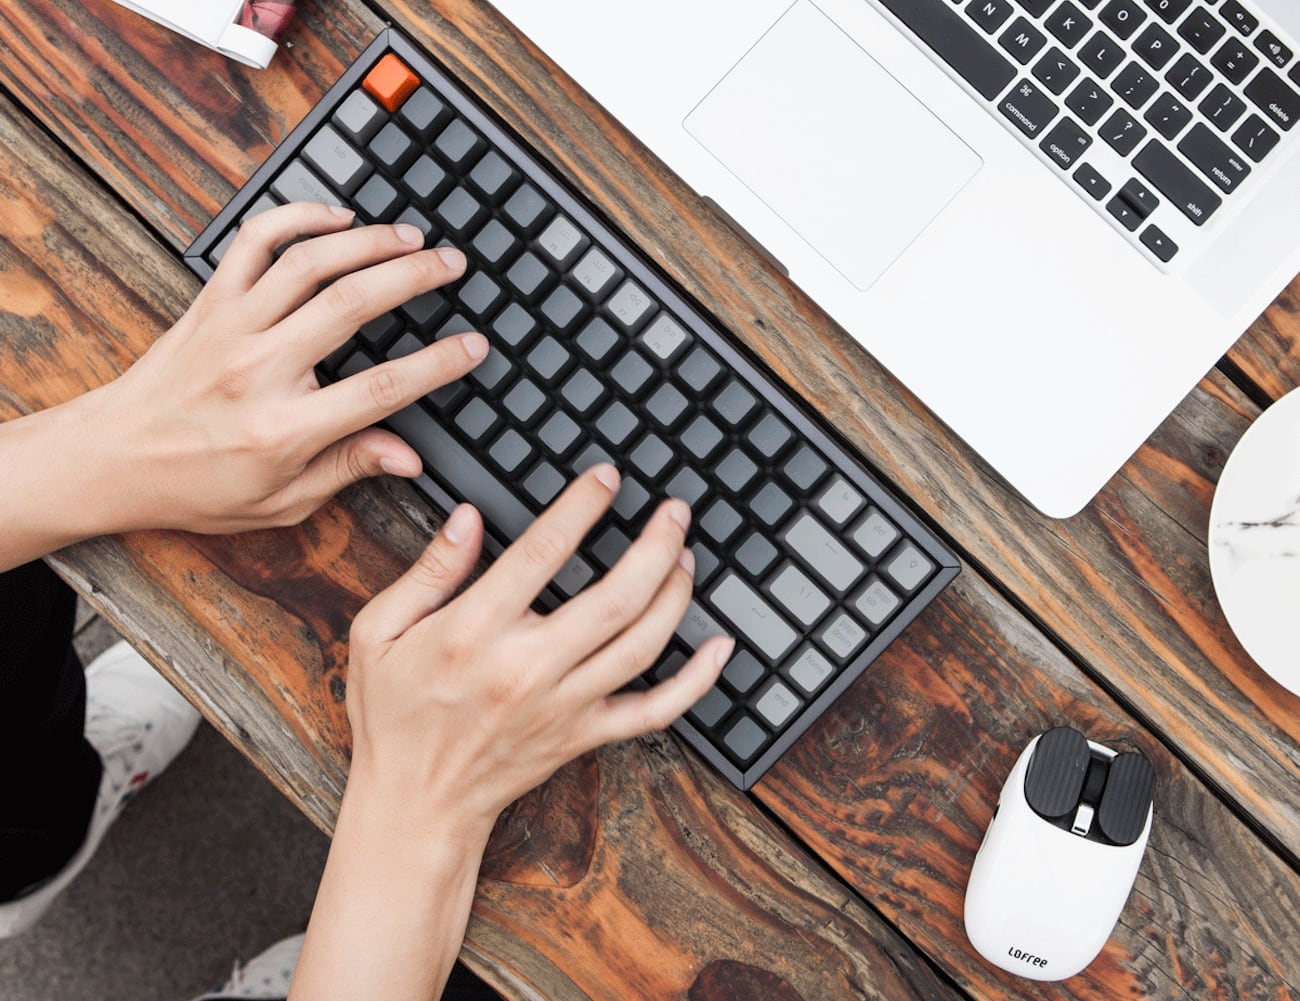 Keychron K2 Compact Wireless Mechanical Keyboard comes with 84 keys